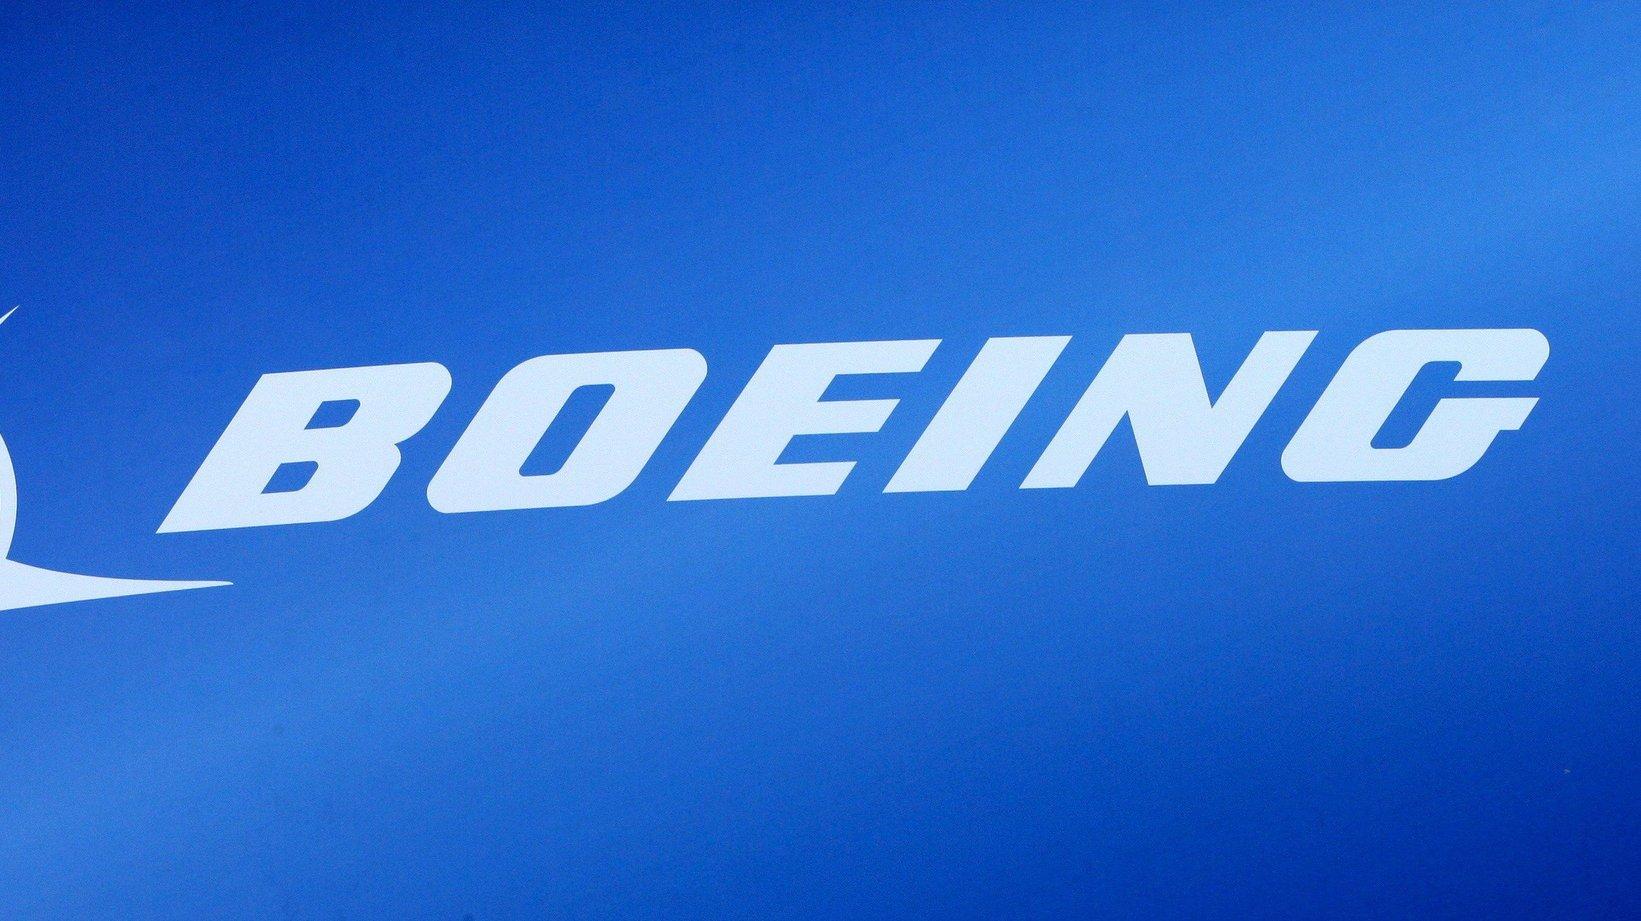 logotipo da empresa BOEING